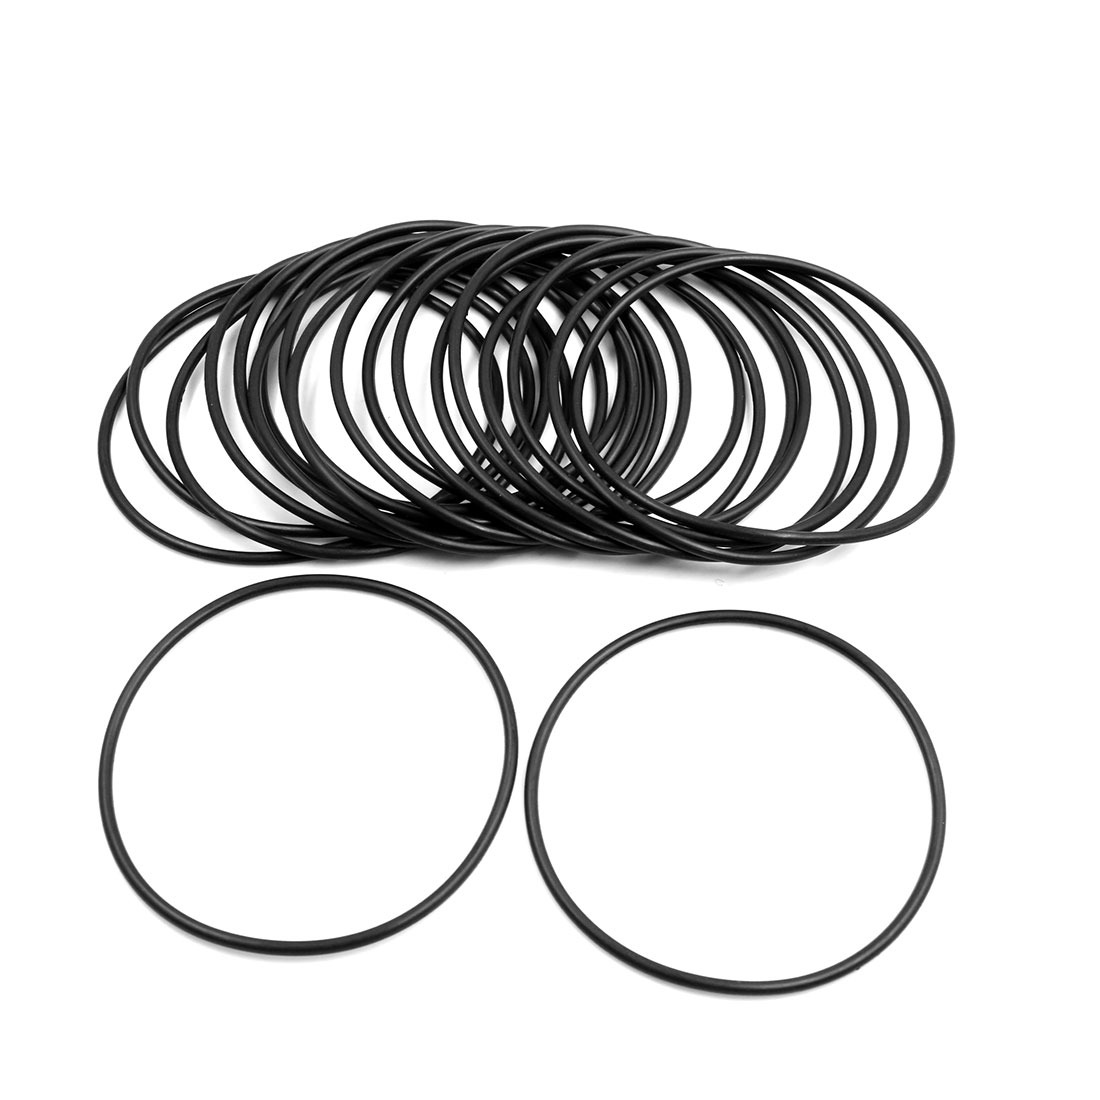 20pcs Black Universal Nitrile Rubber O-Ring Seals Gasket for Car 100 x 3.55mm